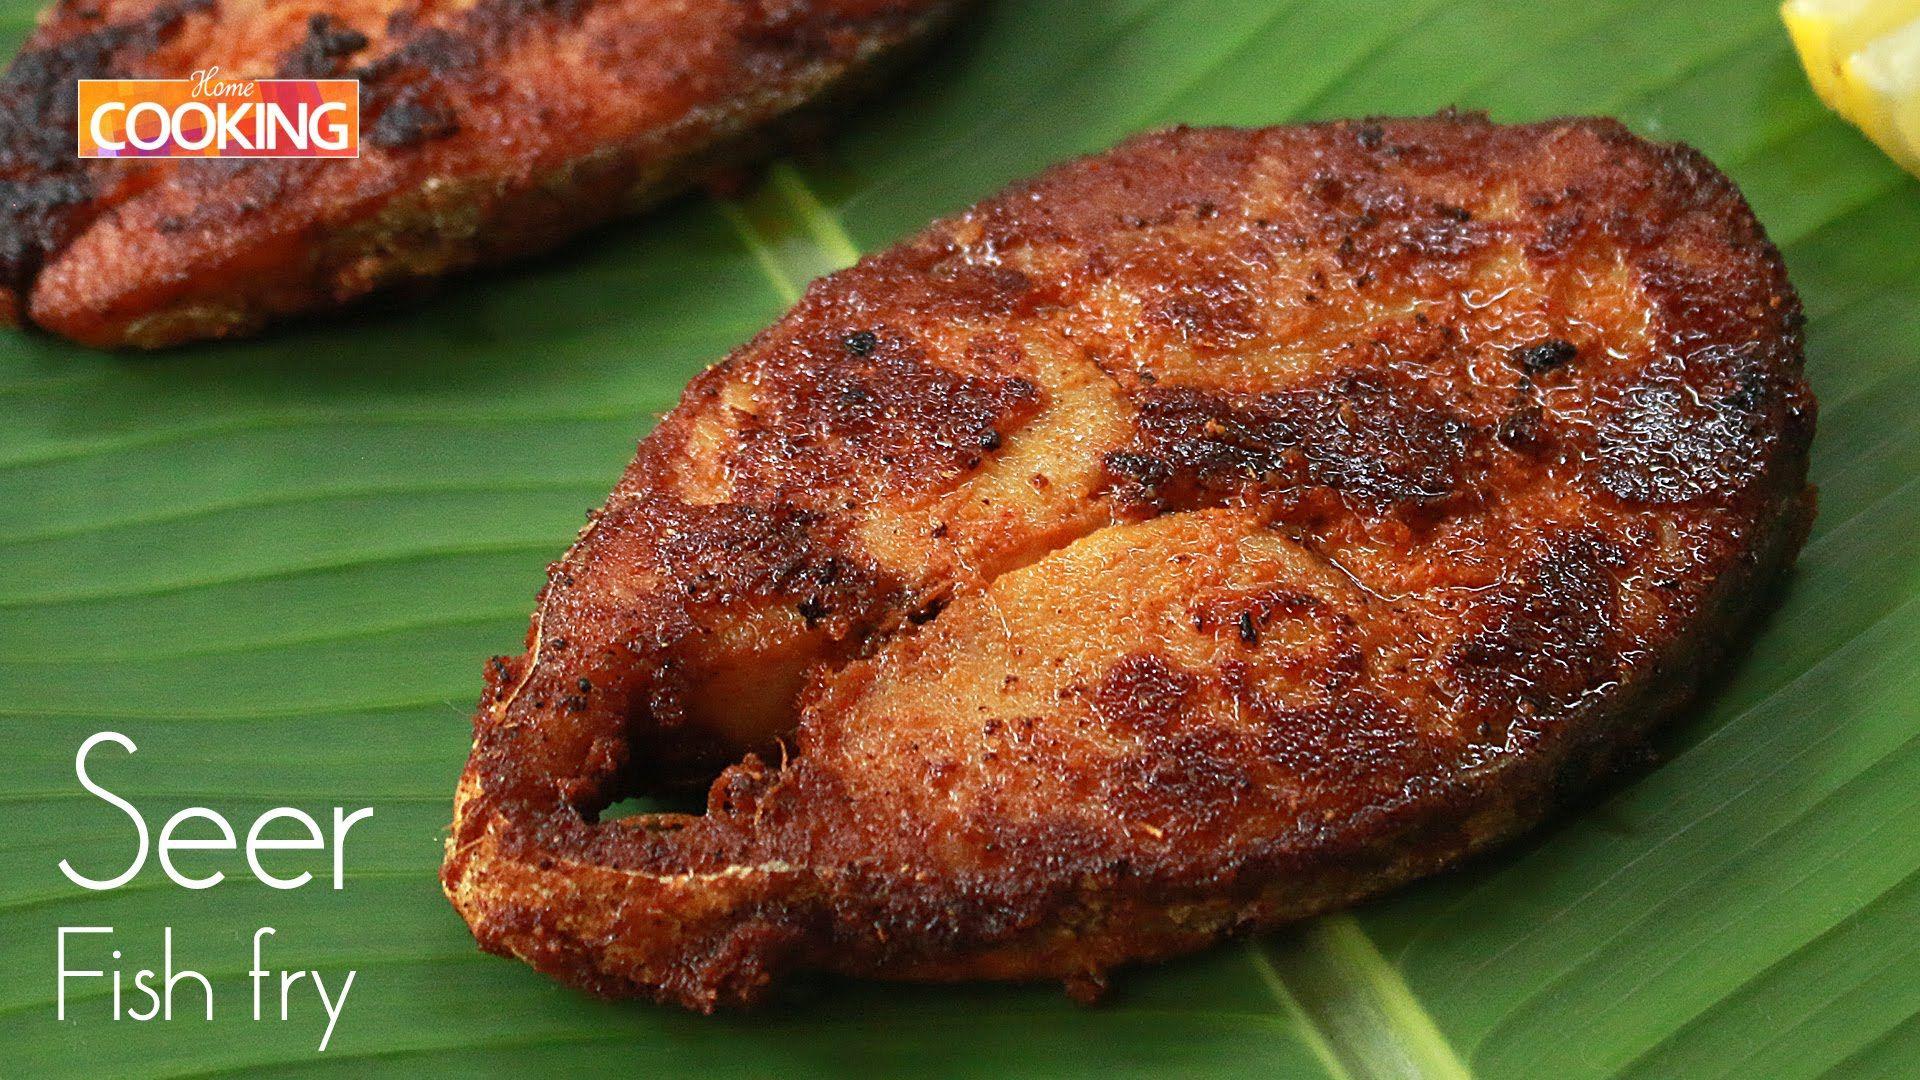 Seer Fish Fry Non Veg Starters Ventuno Home Cooking Fried Fish Fried Fish Recipes Cooking